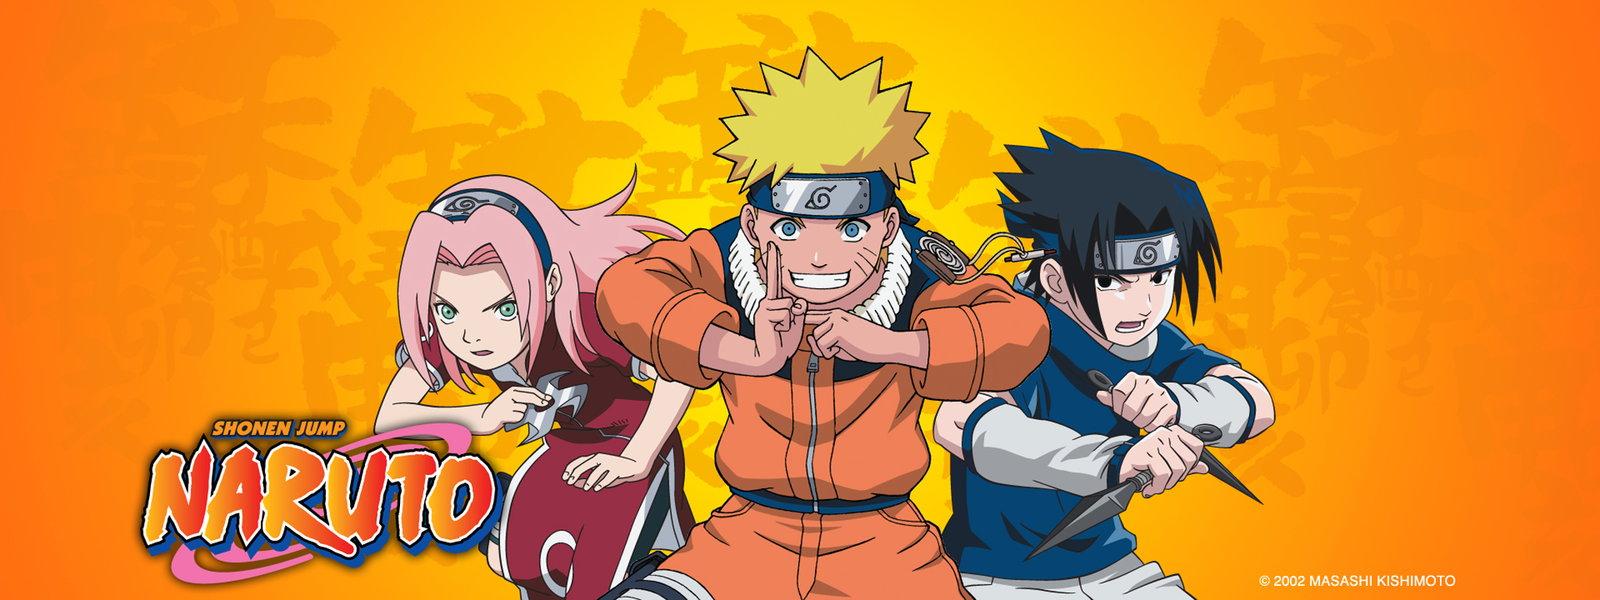 Retro Game Club – Naruto